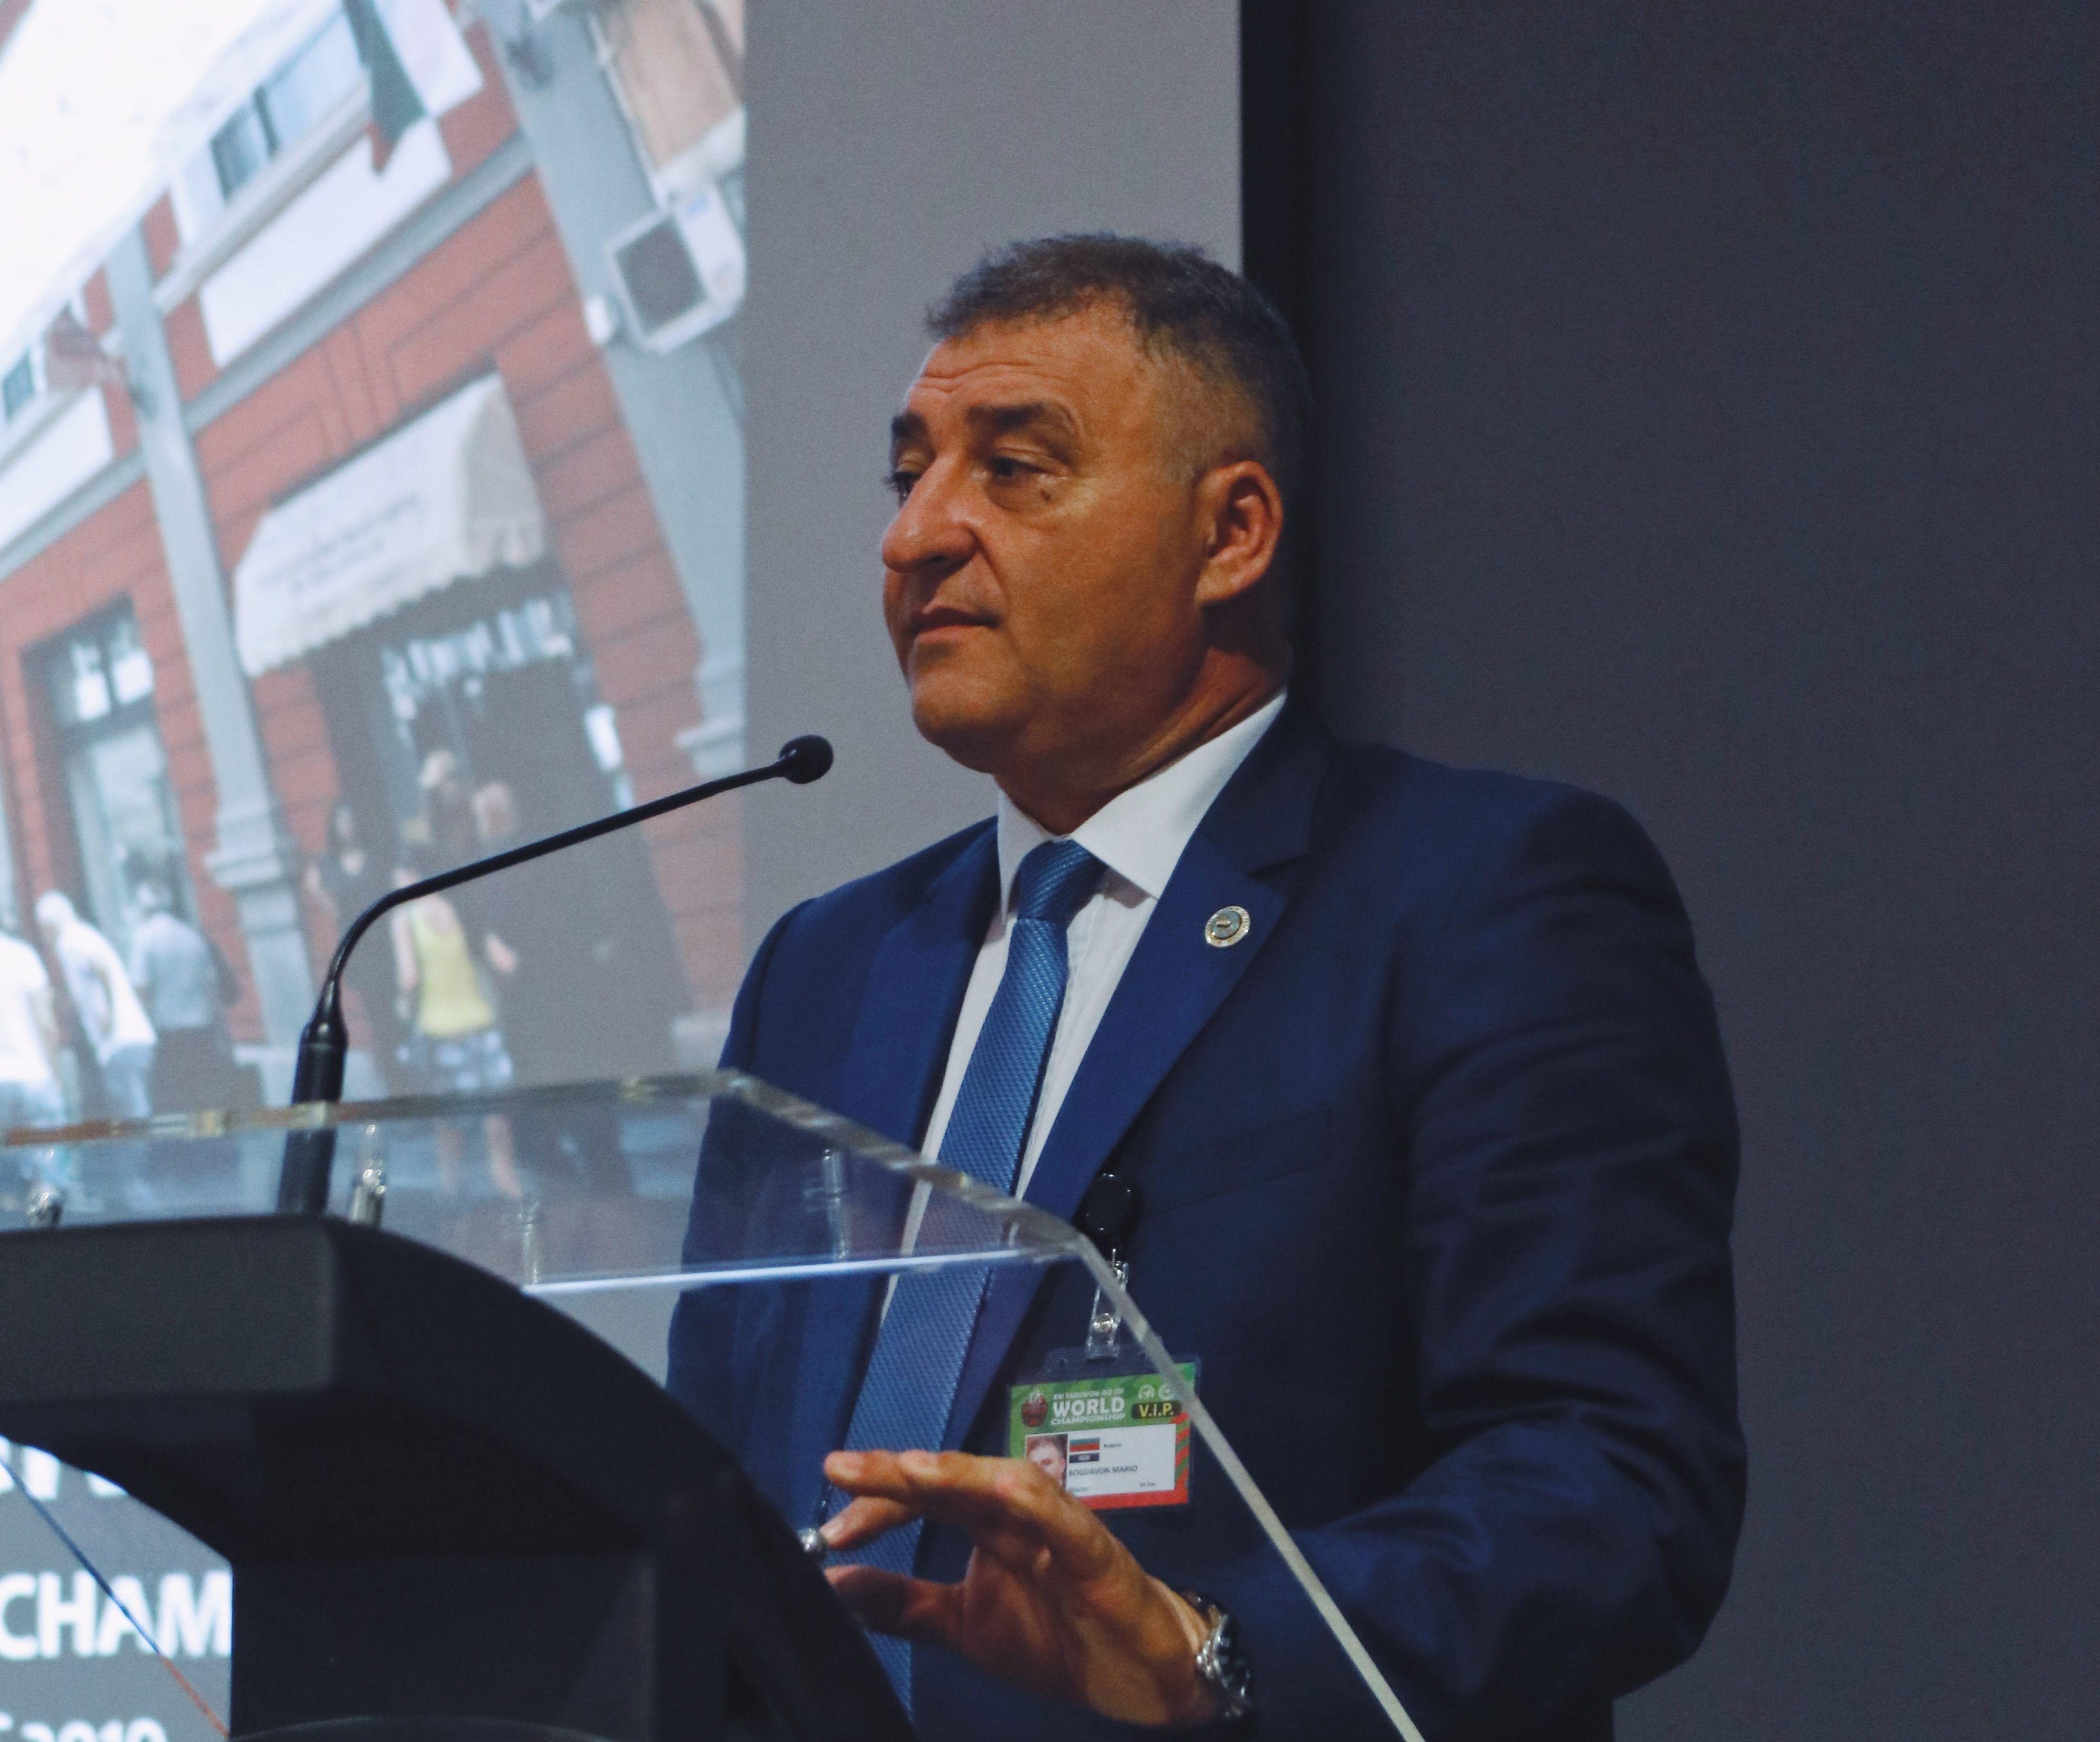 Преизбраха Марио Богданов за вицепрезидент на световното таекуондо ITF